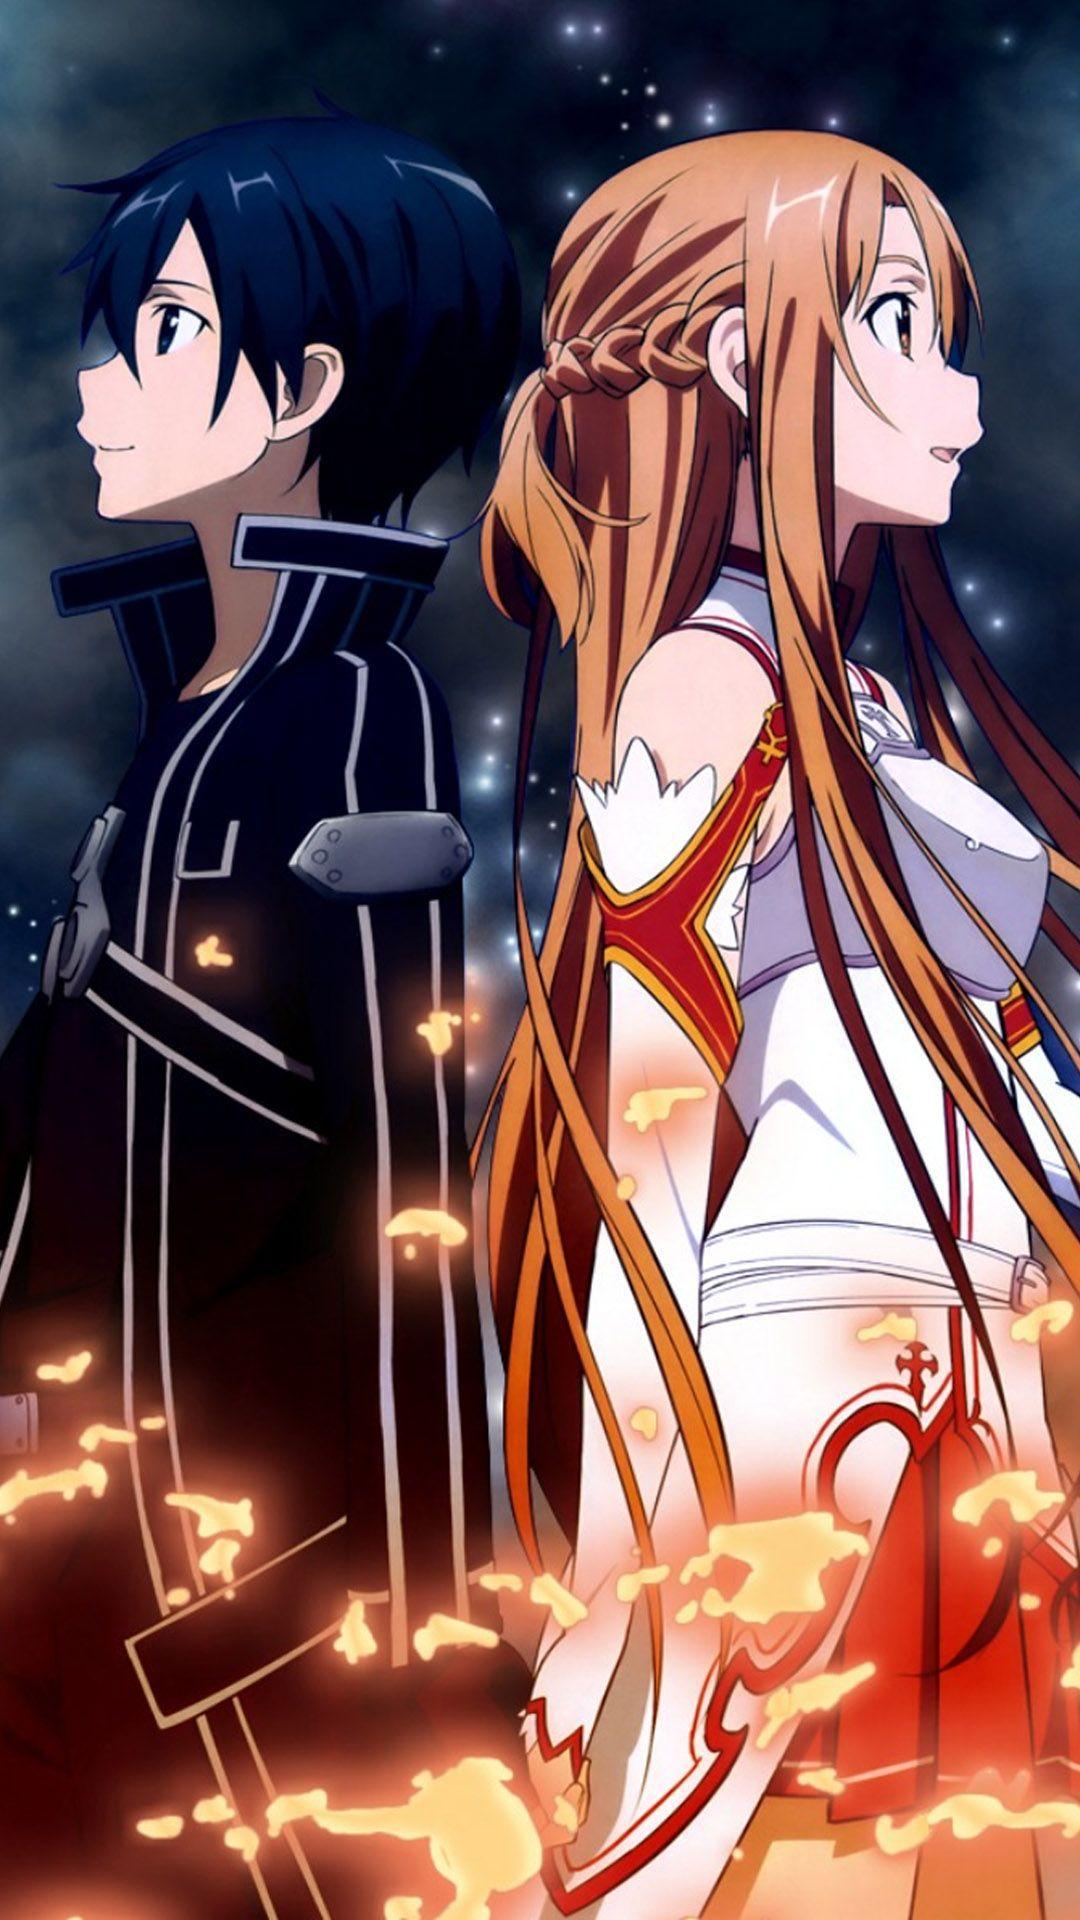 Unduh 200 Wallpaper Anime Untuk Hp HD